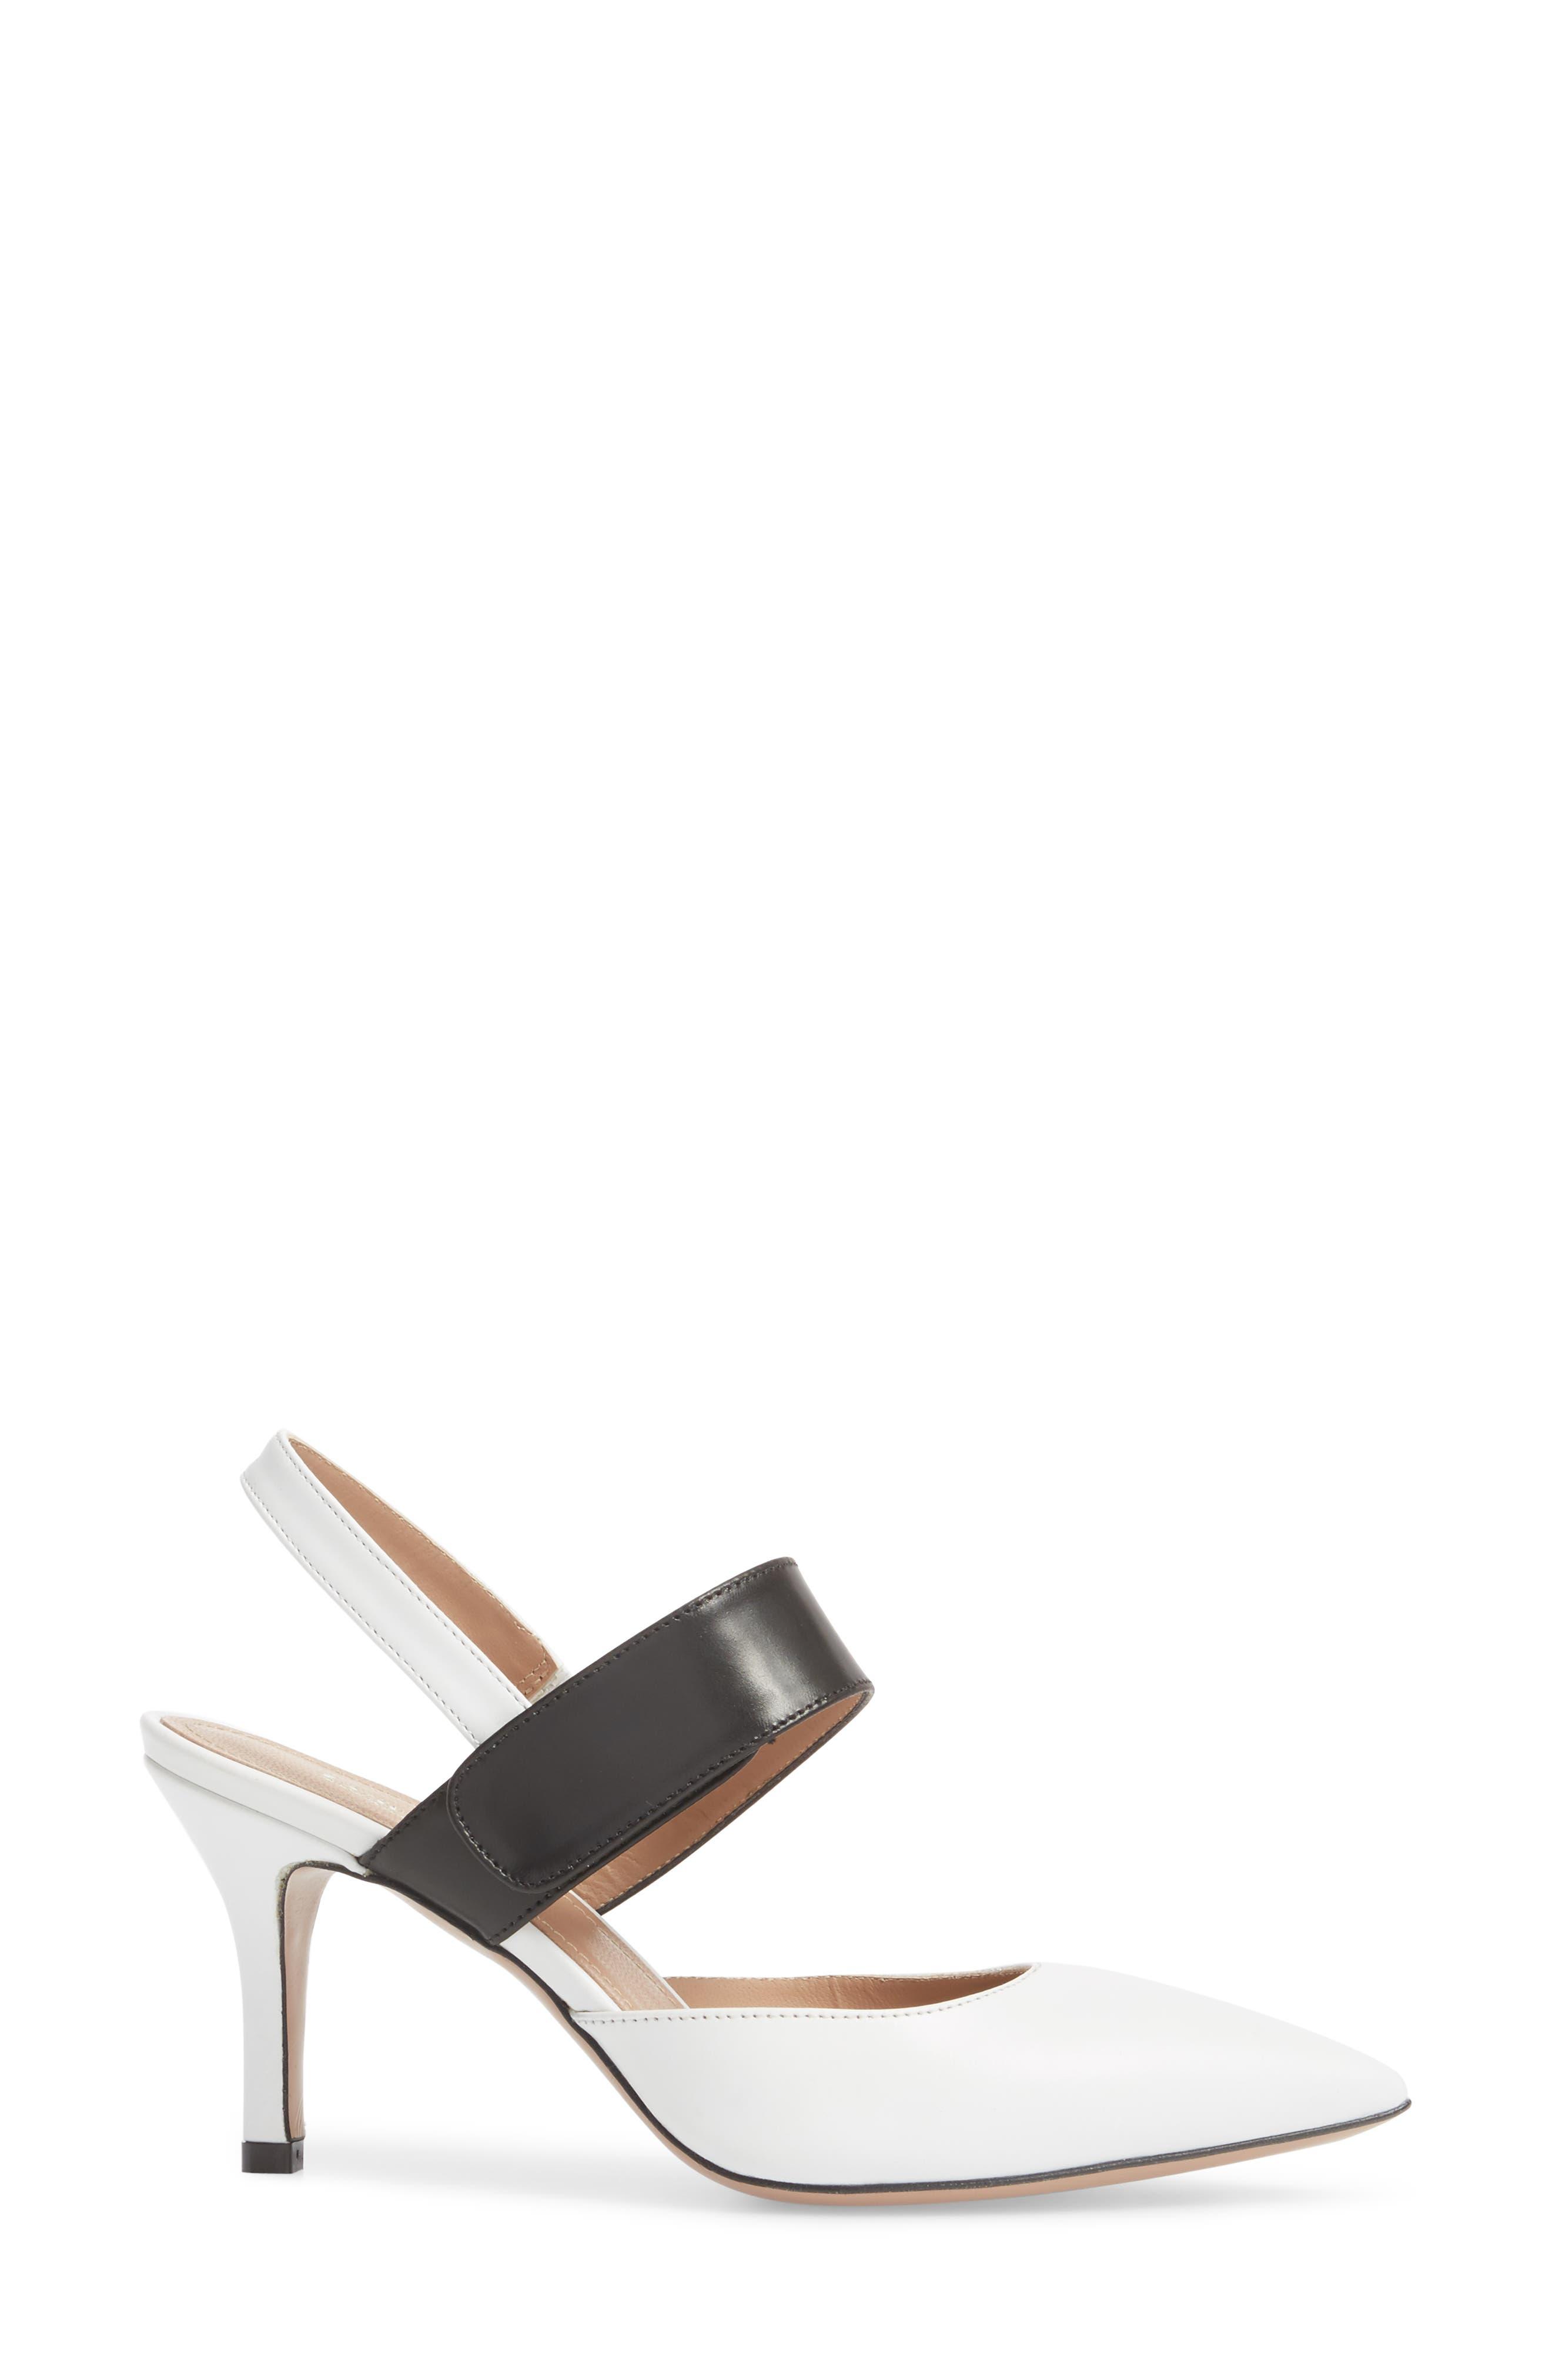 Viola Pump,                             Alternate thumbnail 3, color,                             White/ Black Leather